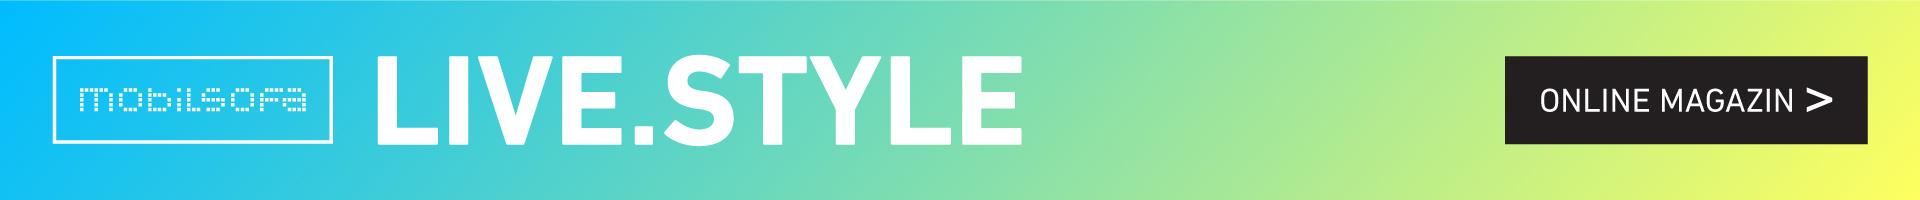 Mobilsofa Liife.Style magazin